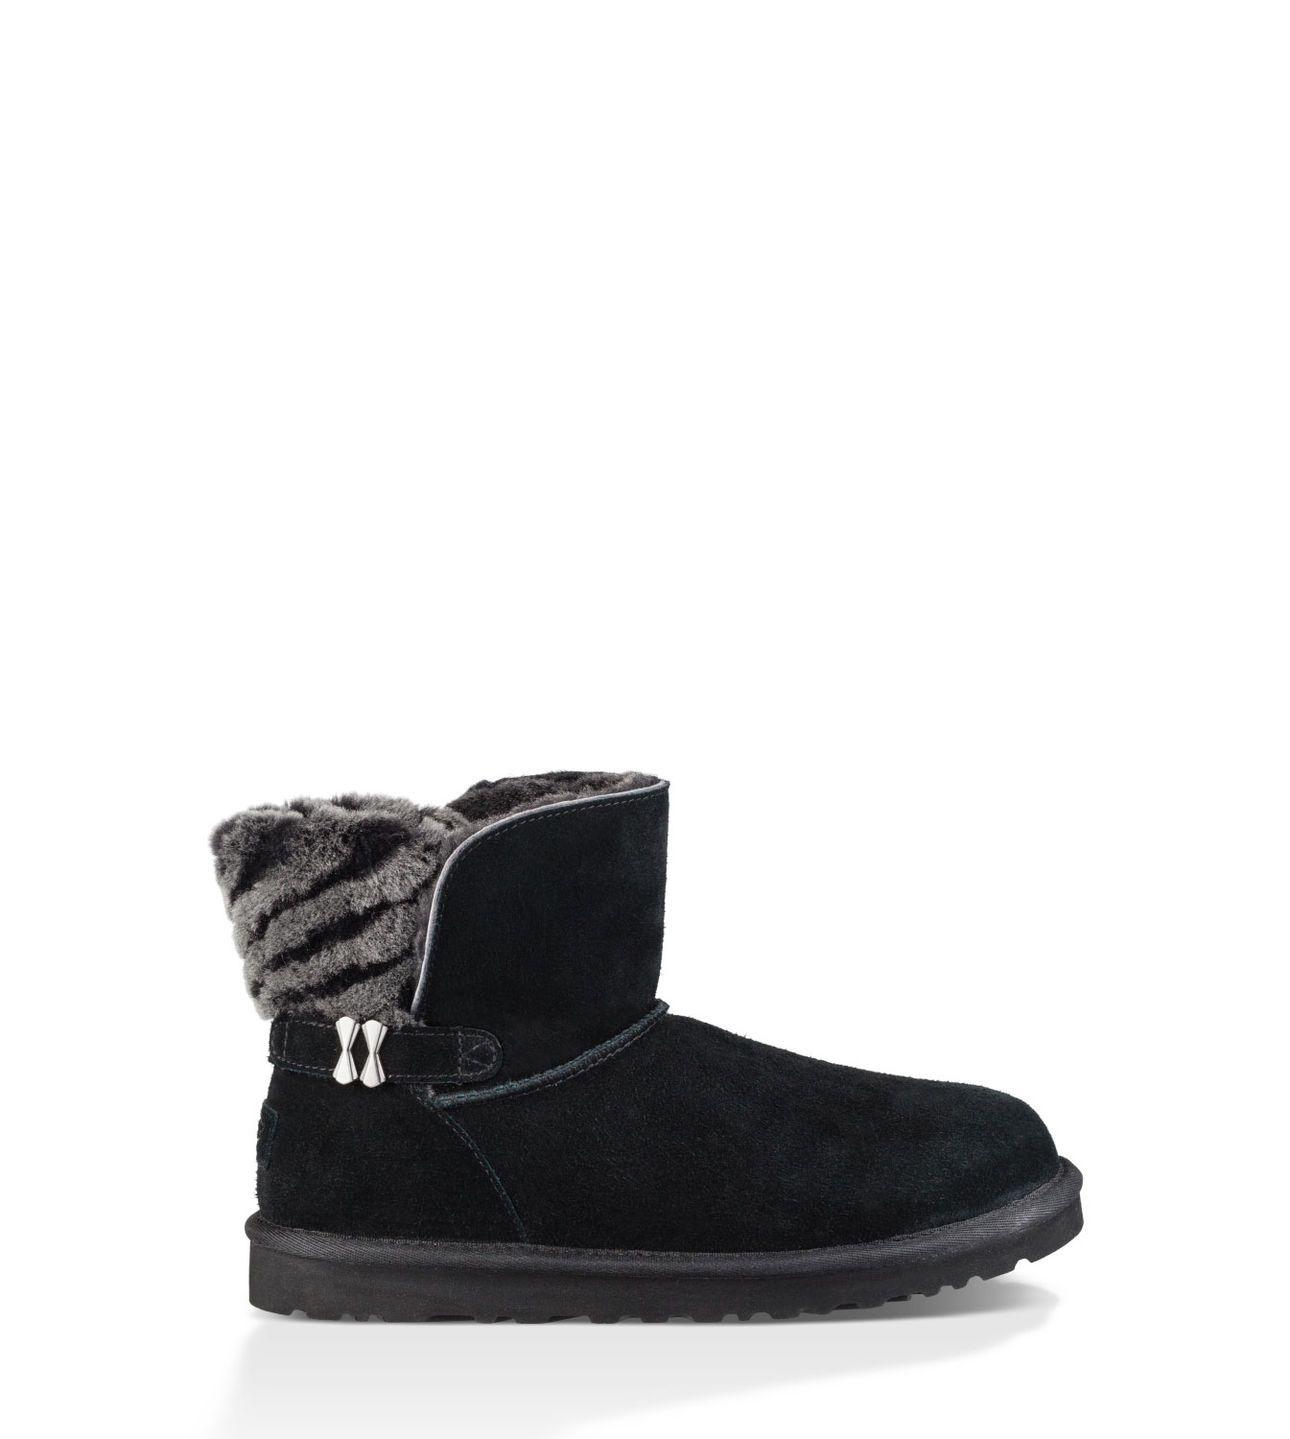 5ffd3678f0b UGG® Official   Women's Adria Sheepskin Boots   UGG.com   Voted Best ...